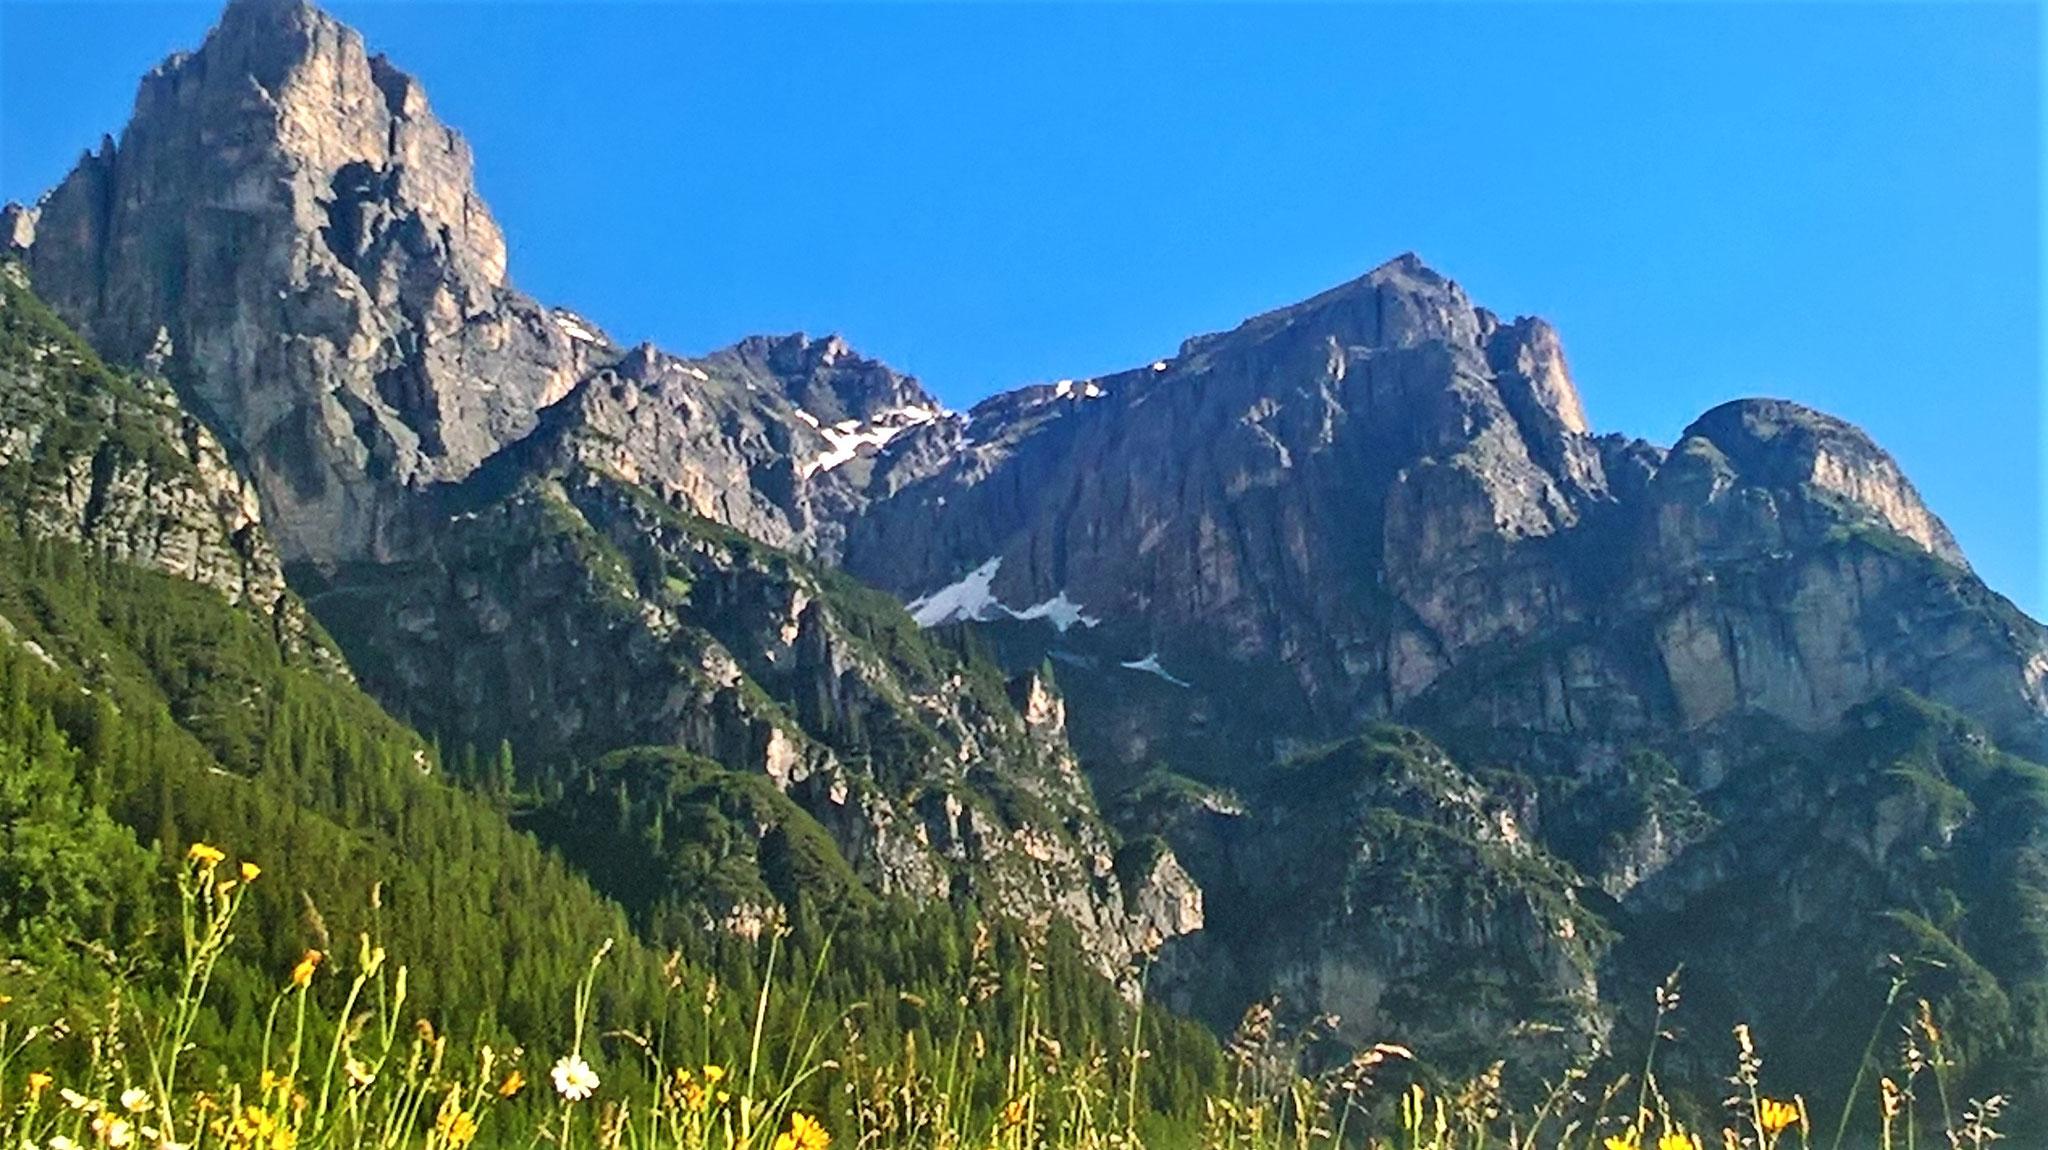 Kirchdach mit Kirchdachspitze